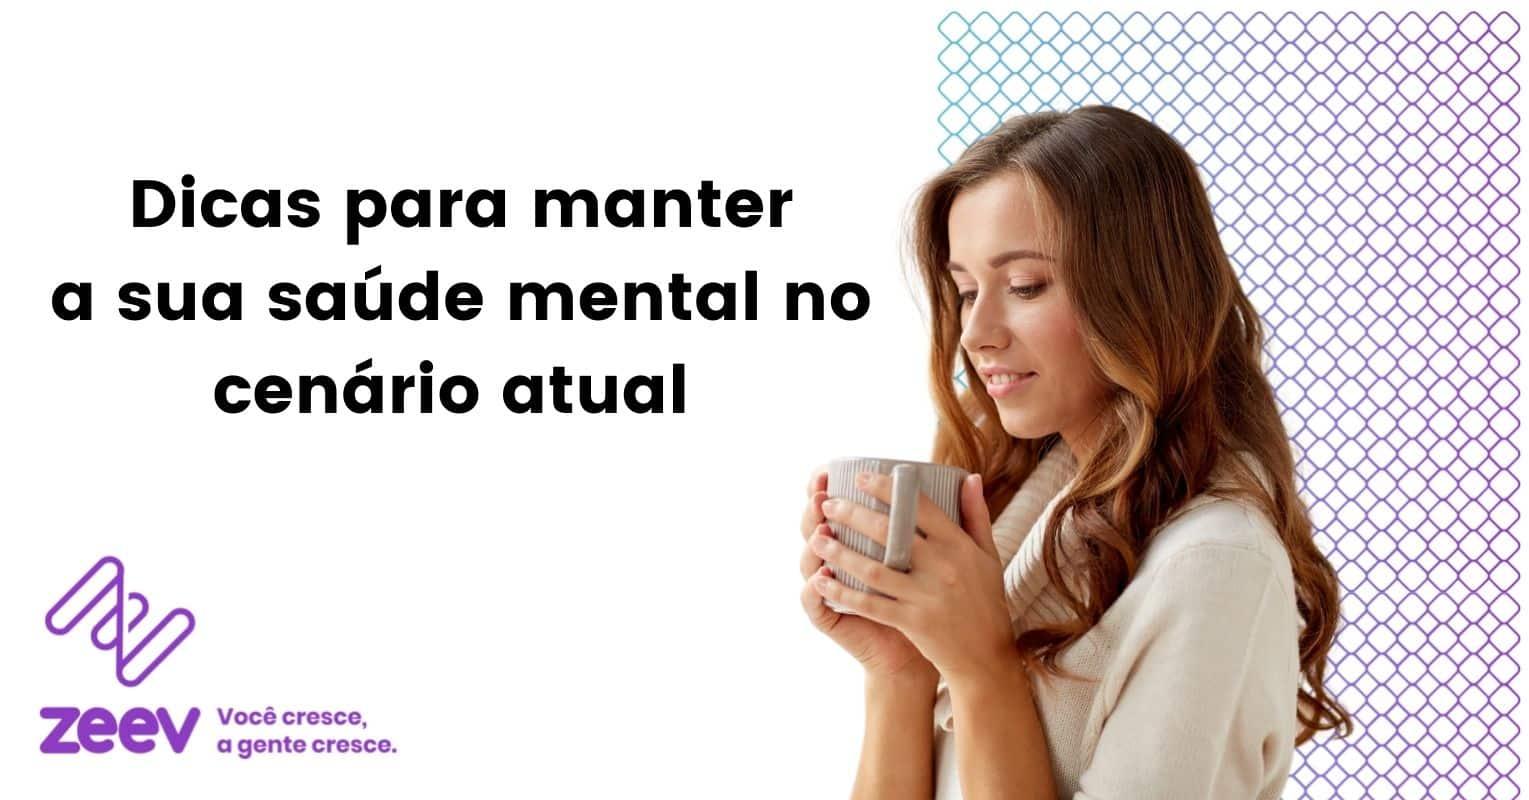 [Banner] Blogpost saúde mental